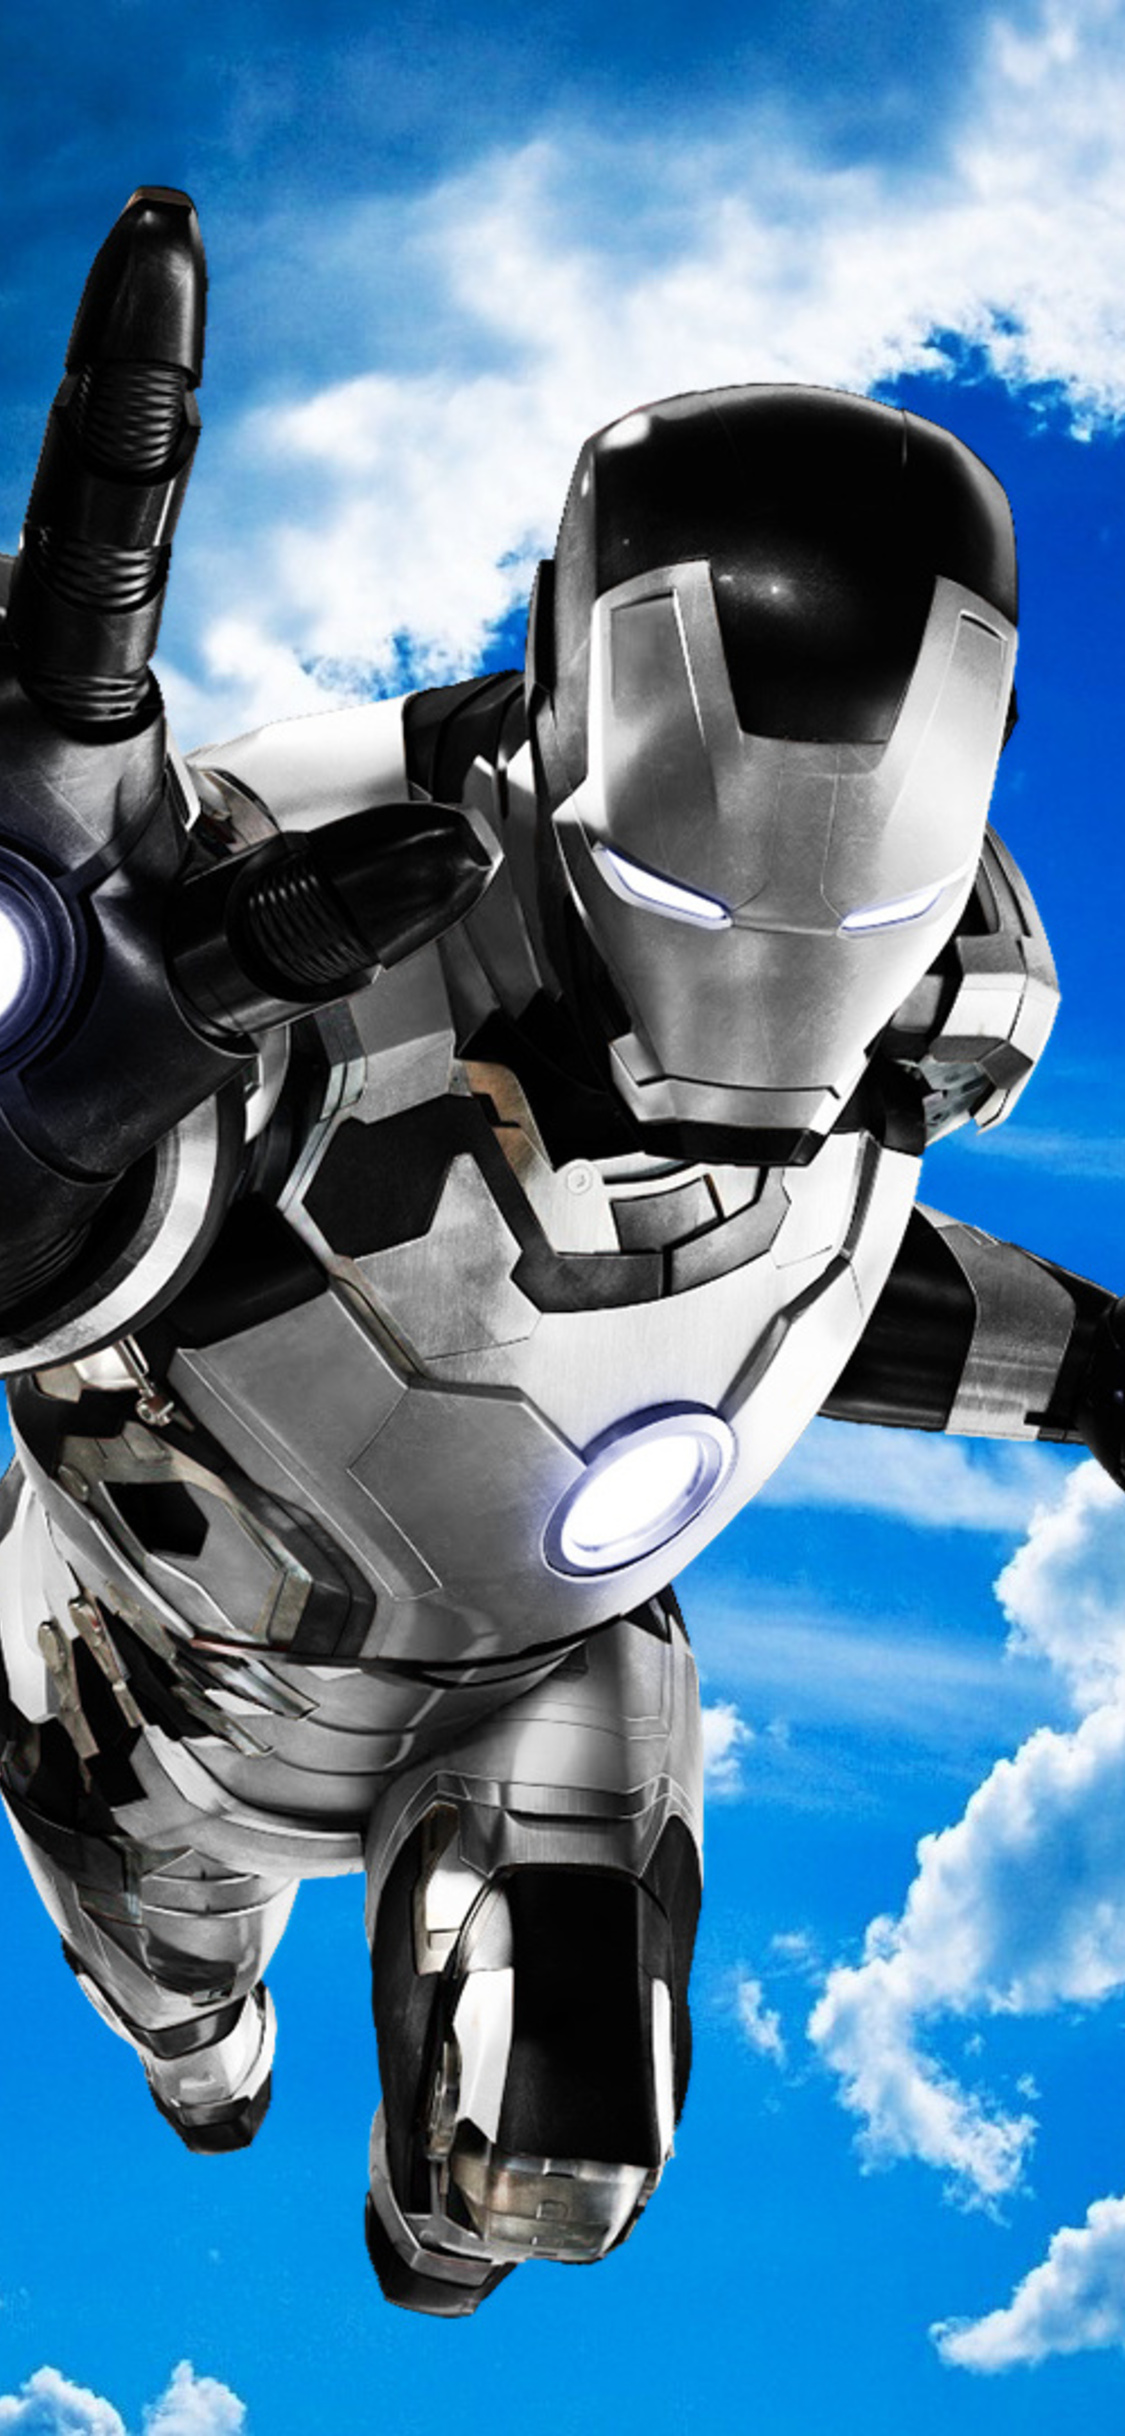 iron-man-mark-42-black-and-white-mh.jpg